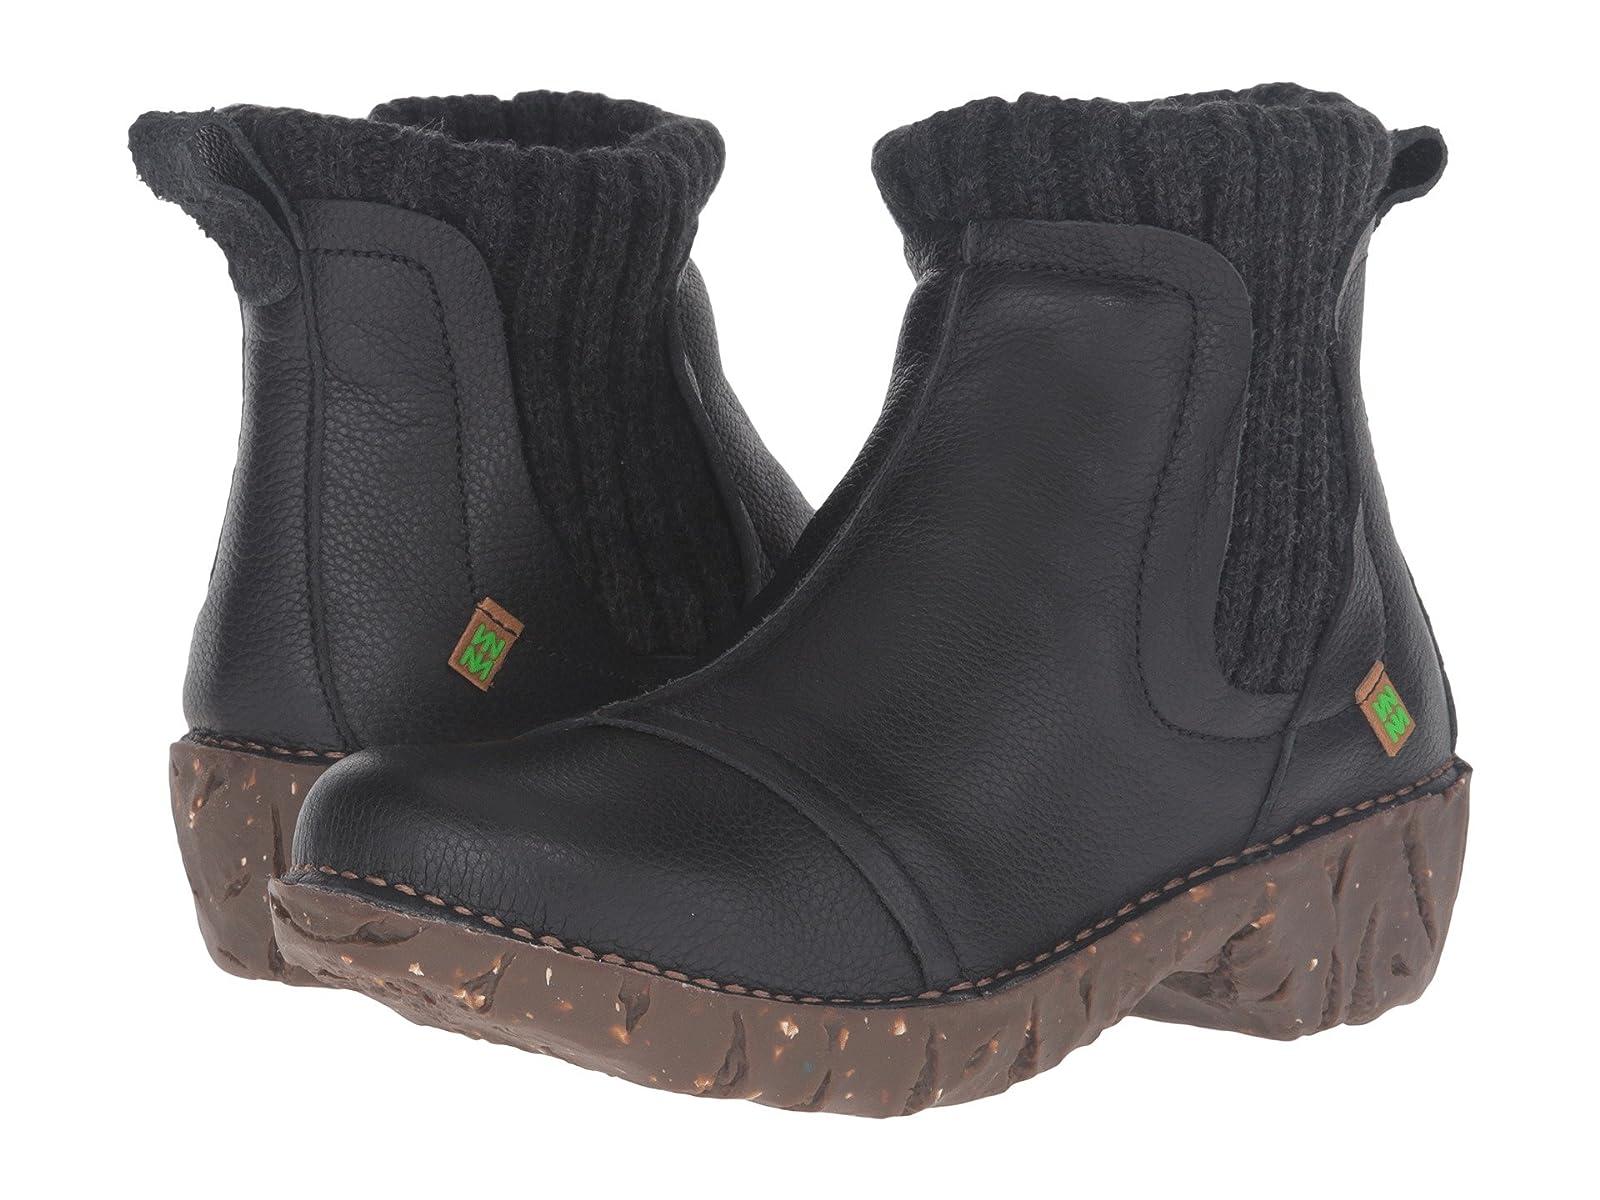 El Naturalista Yggdrasil NE23Affordable and distinctive shoes